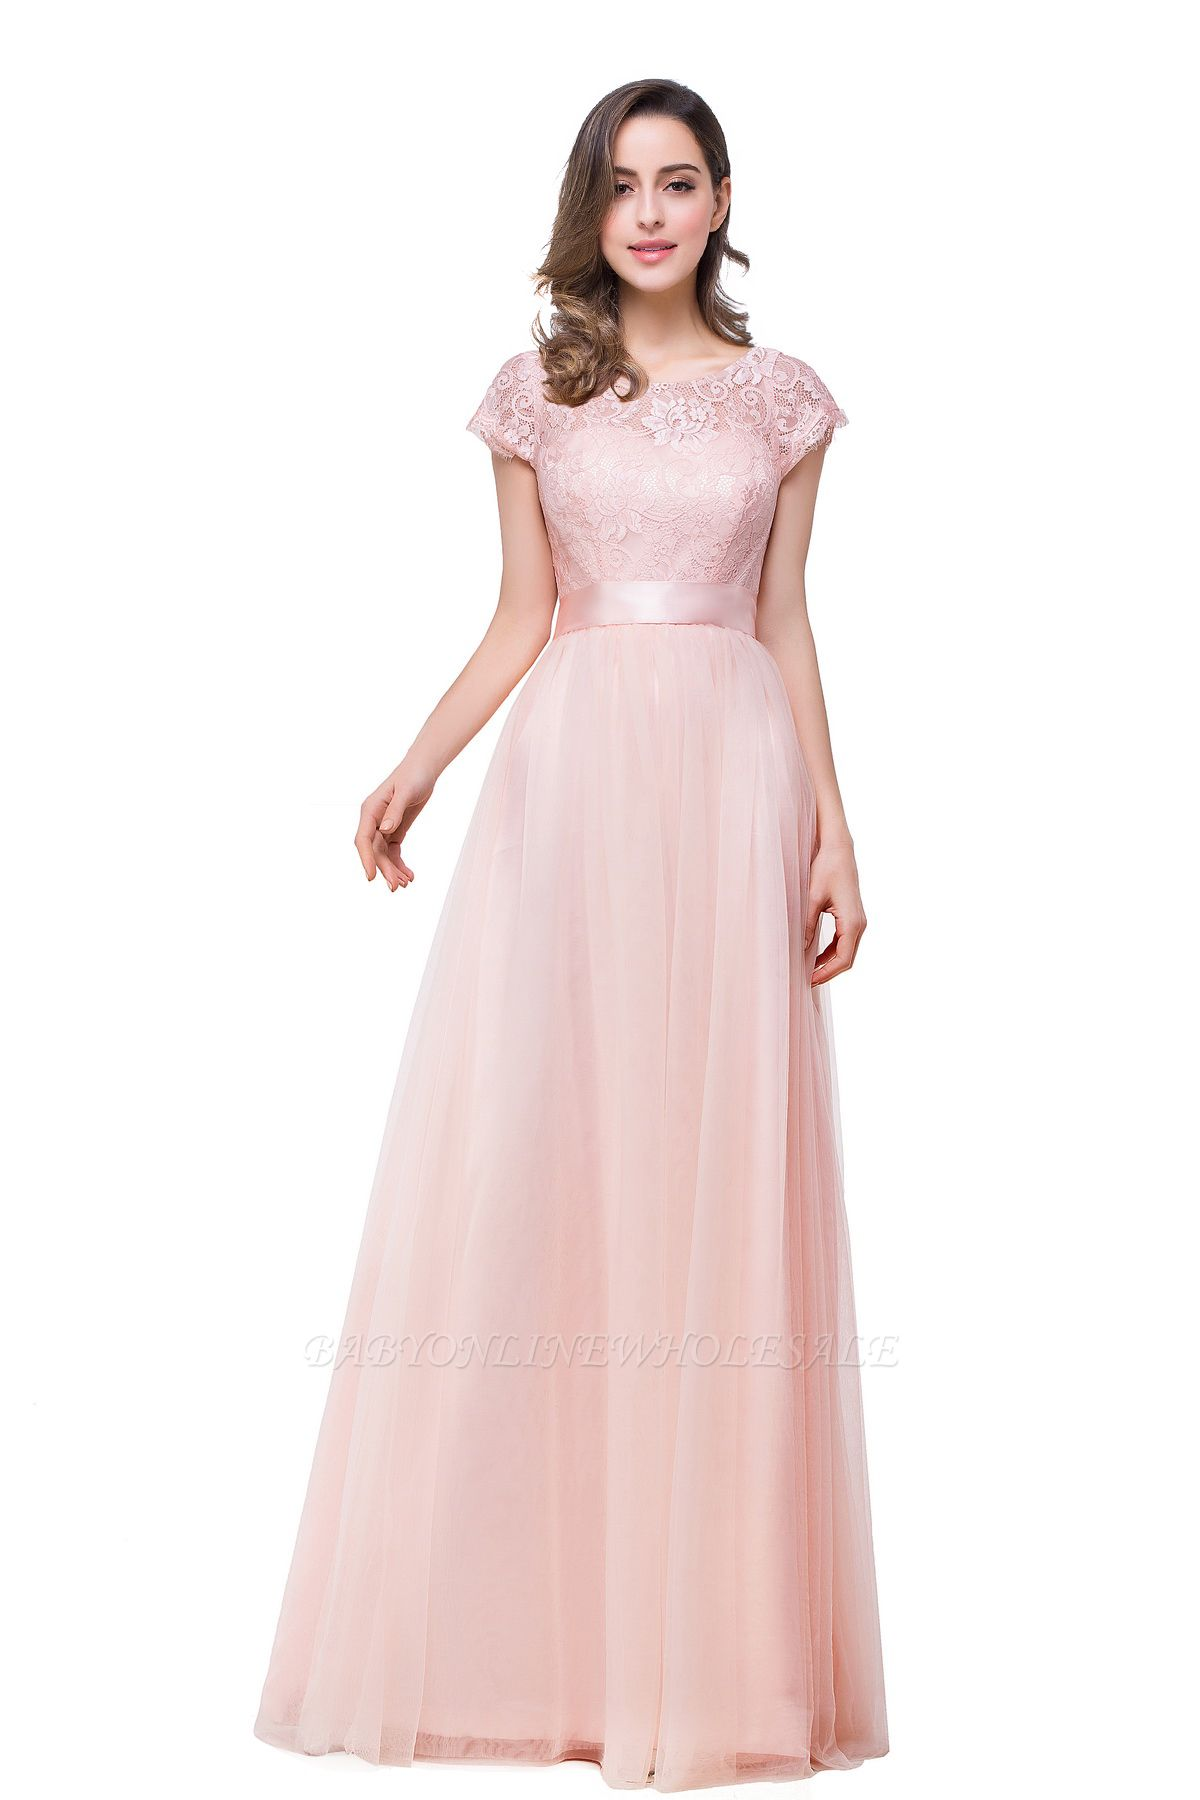 ELLIANA | A-line Short Sleeve Chiffon Bridesmaid Dresses with Ribbon Bow Sash